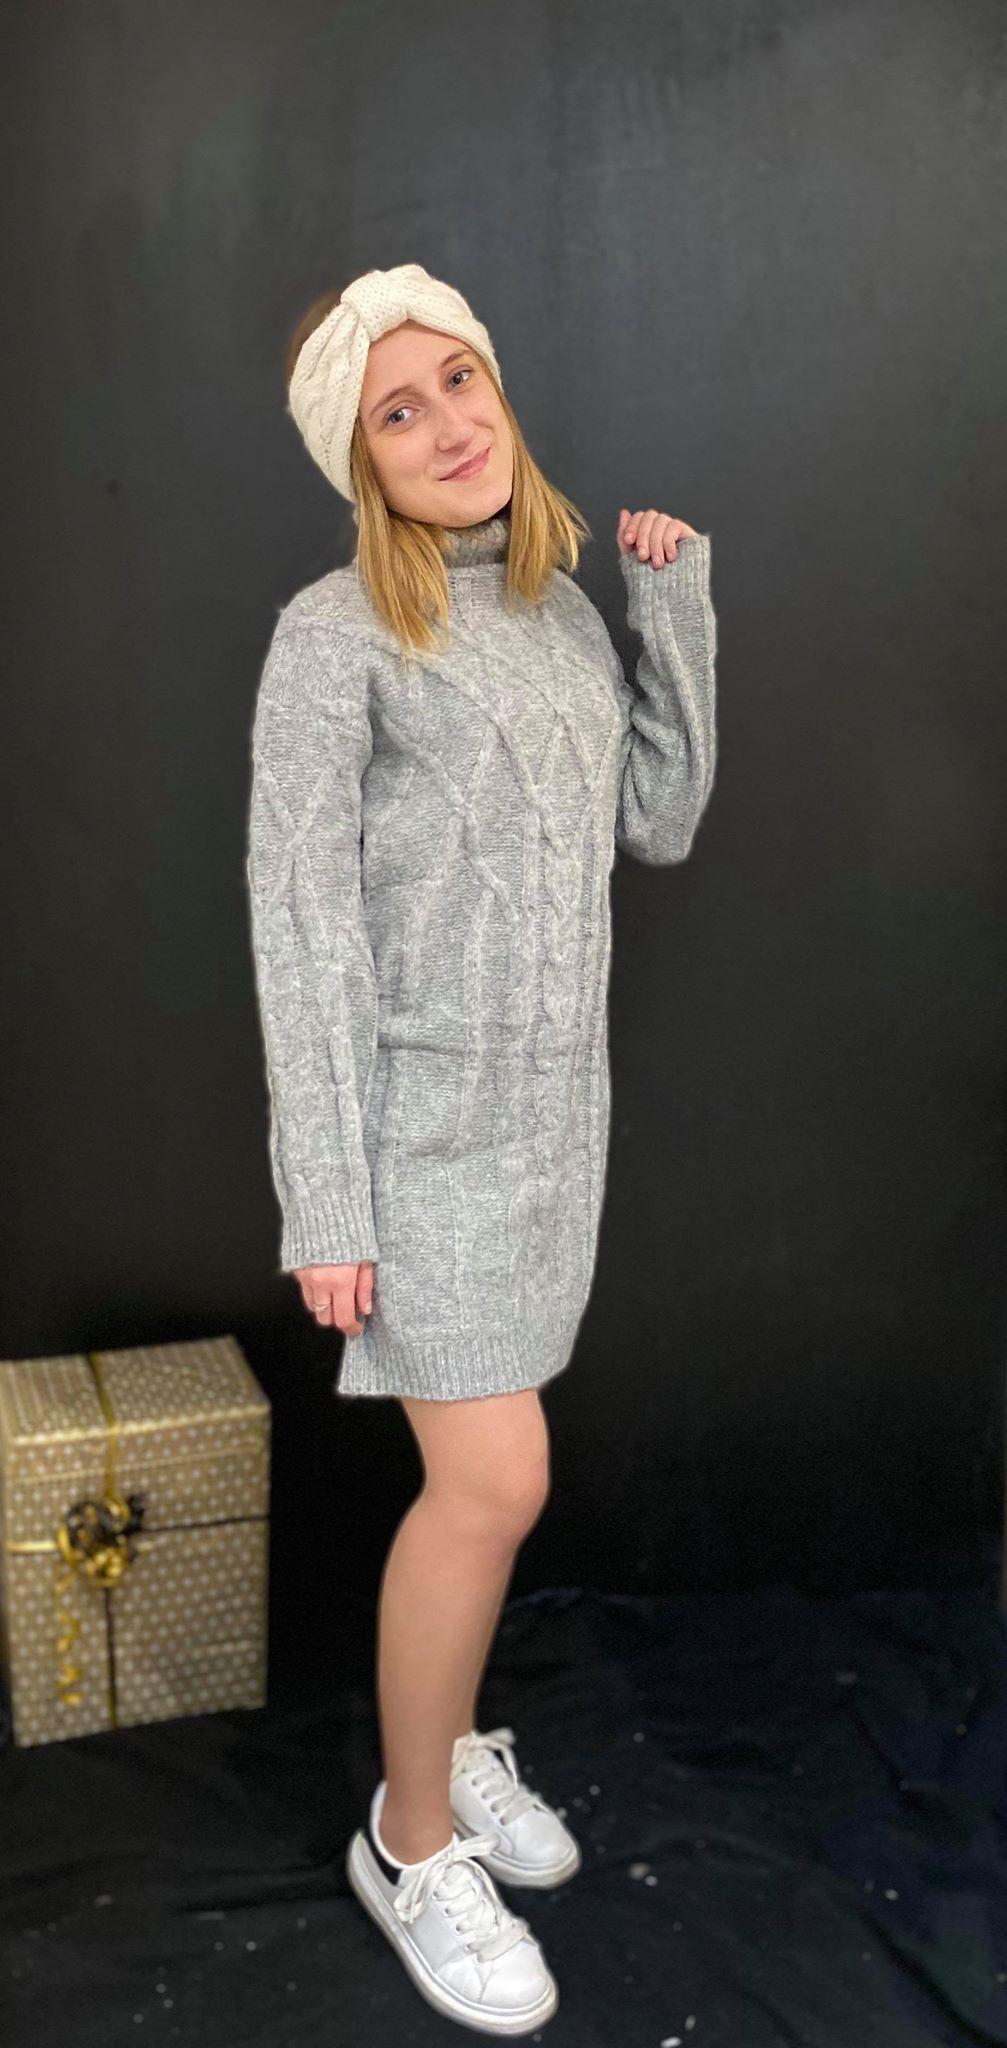 robe grise col roulé - ROB_GRI_VOL_ROU